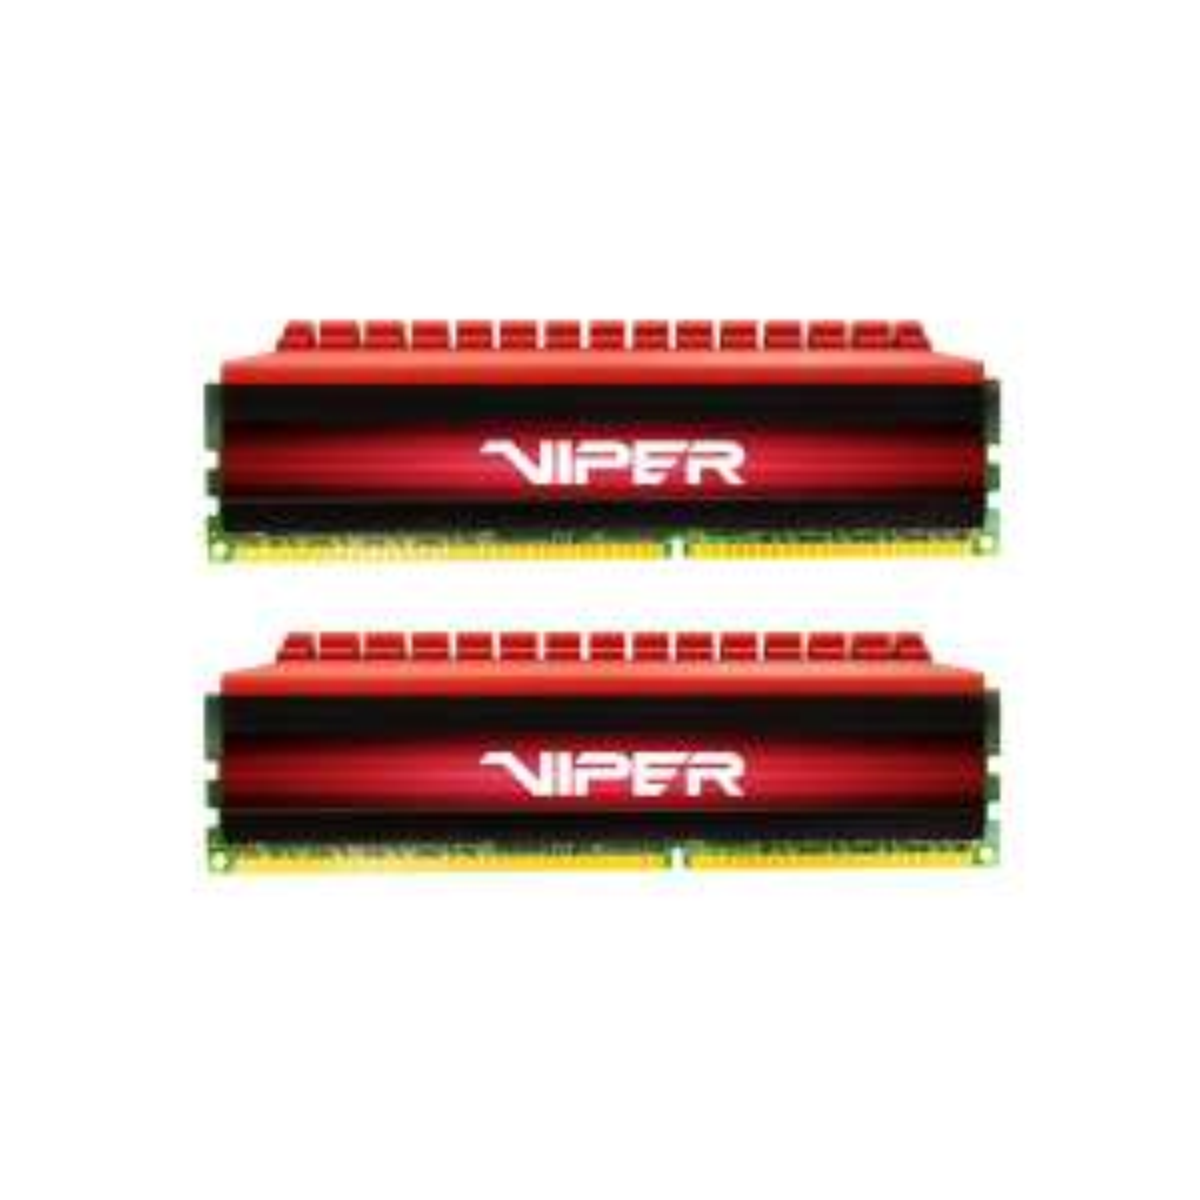 Patriot Memory PV48G300C6K VIPER 4 Series 3000 MHz 8 GB Dual Channel DDR4 Memory Kit - Black/Red £38.99 @ Amazon